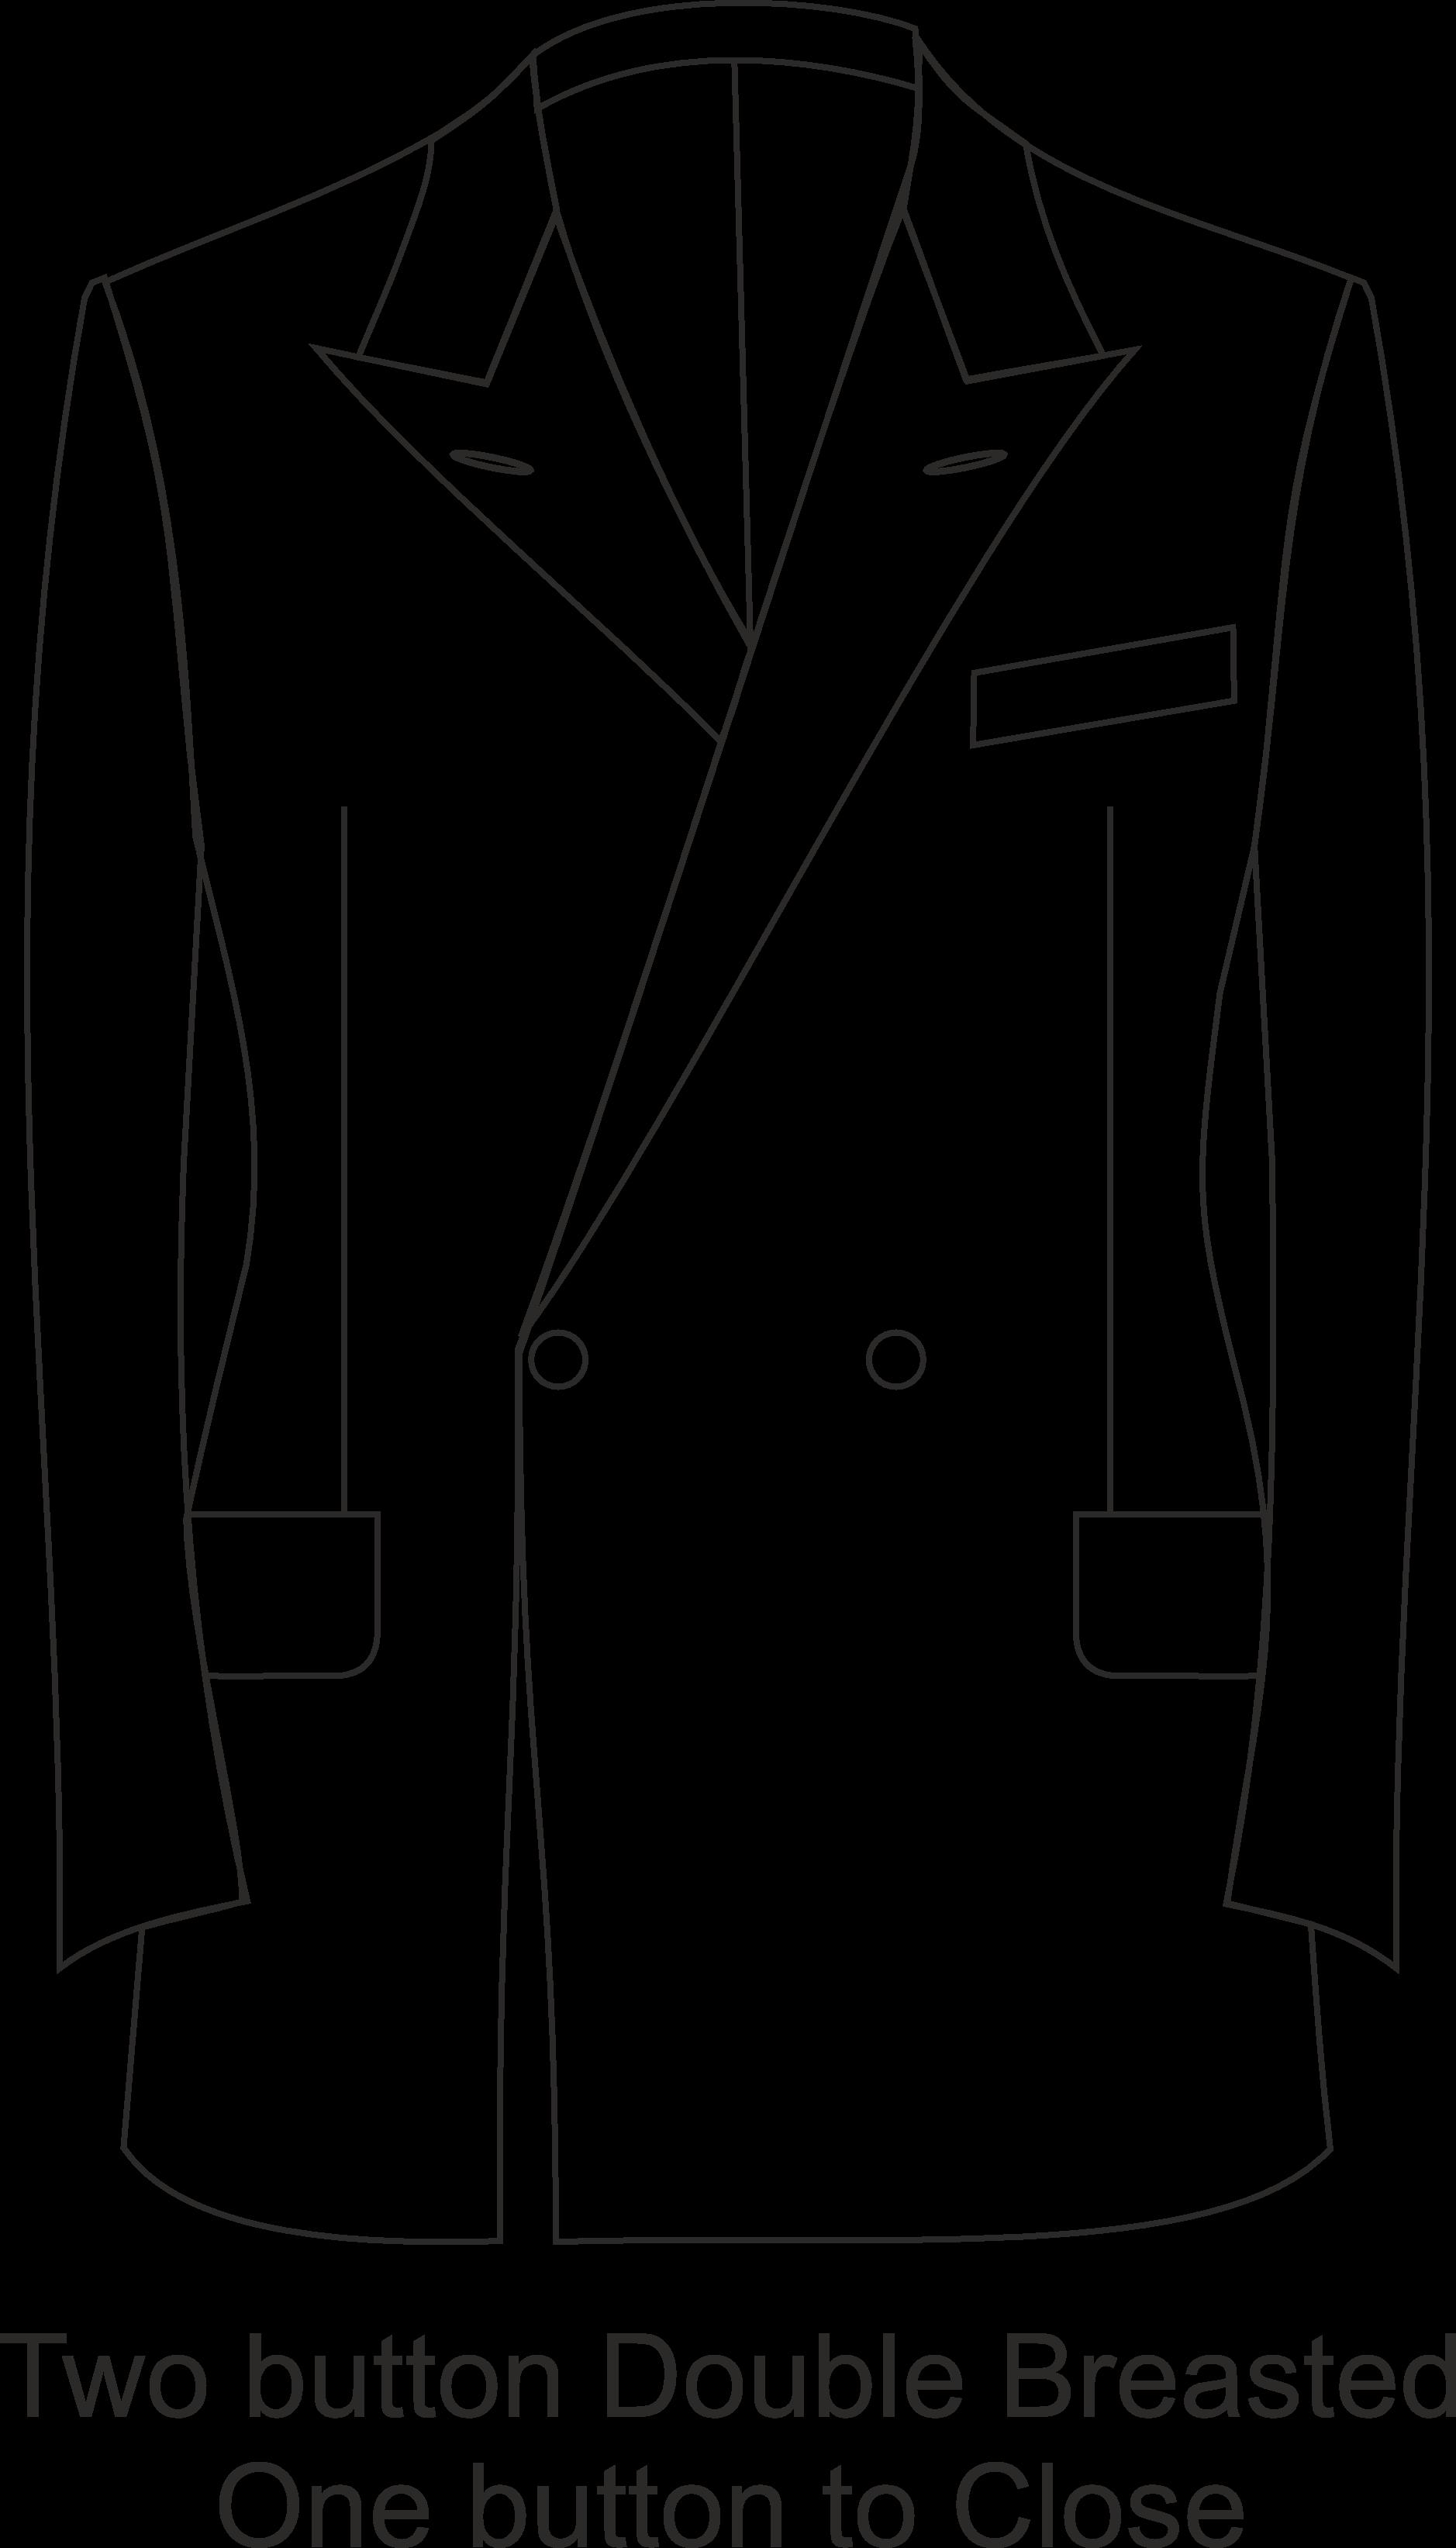 jacket-2bdb1tb